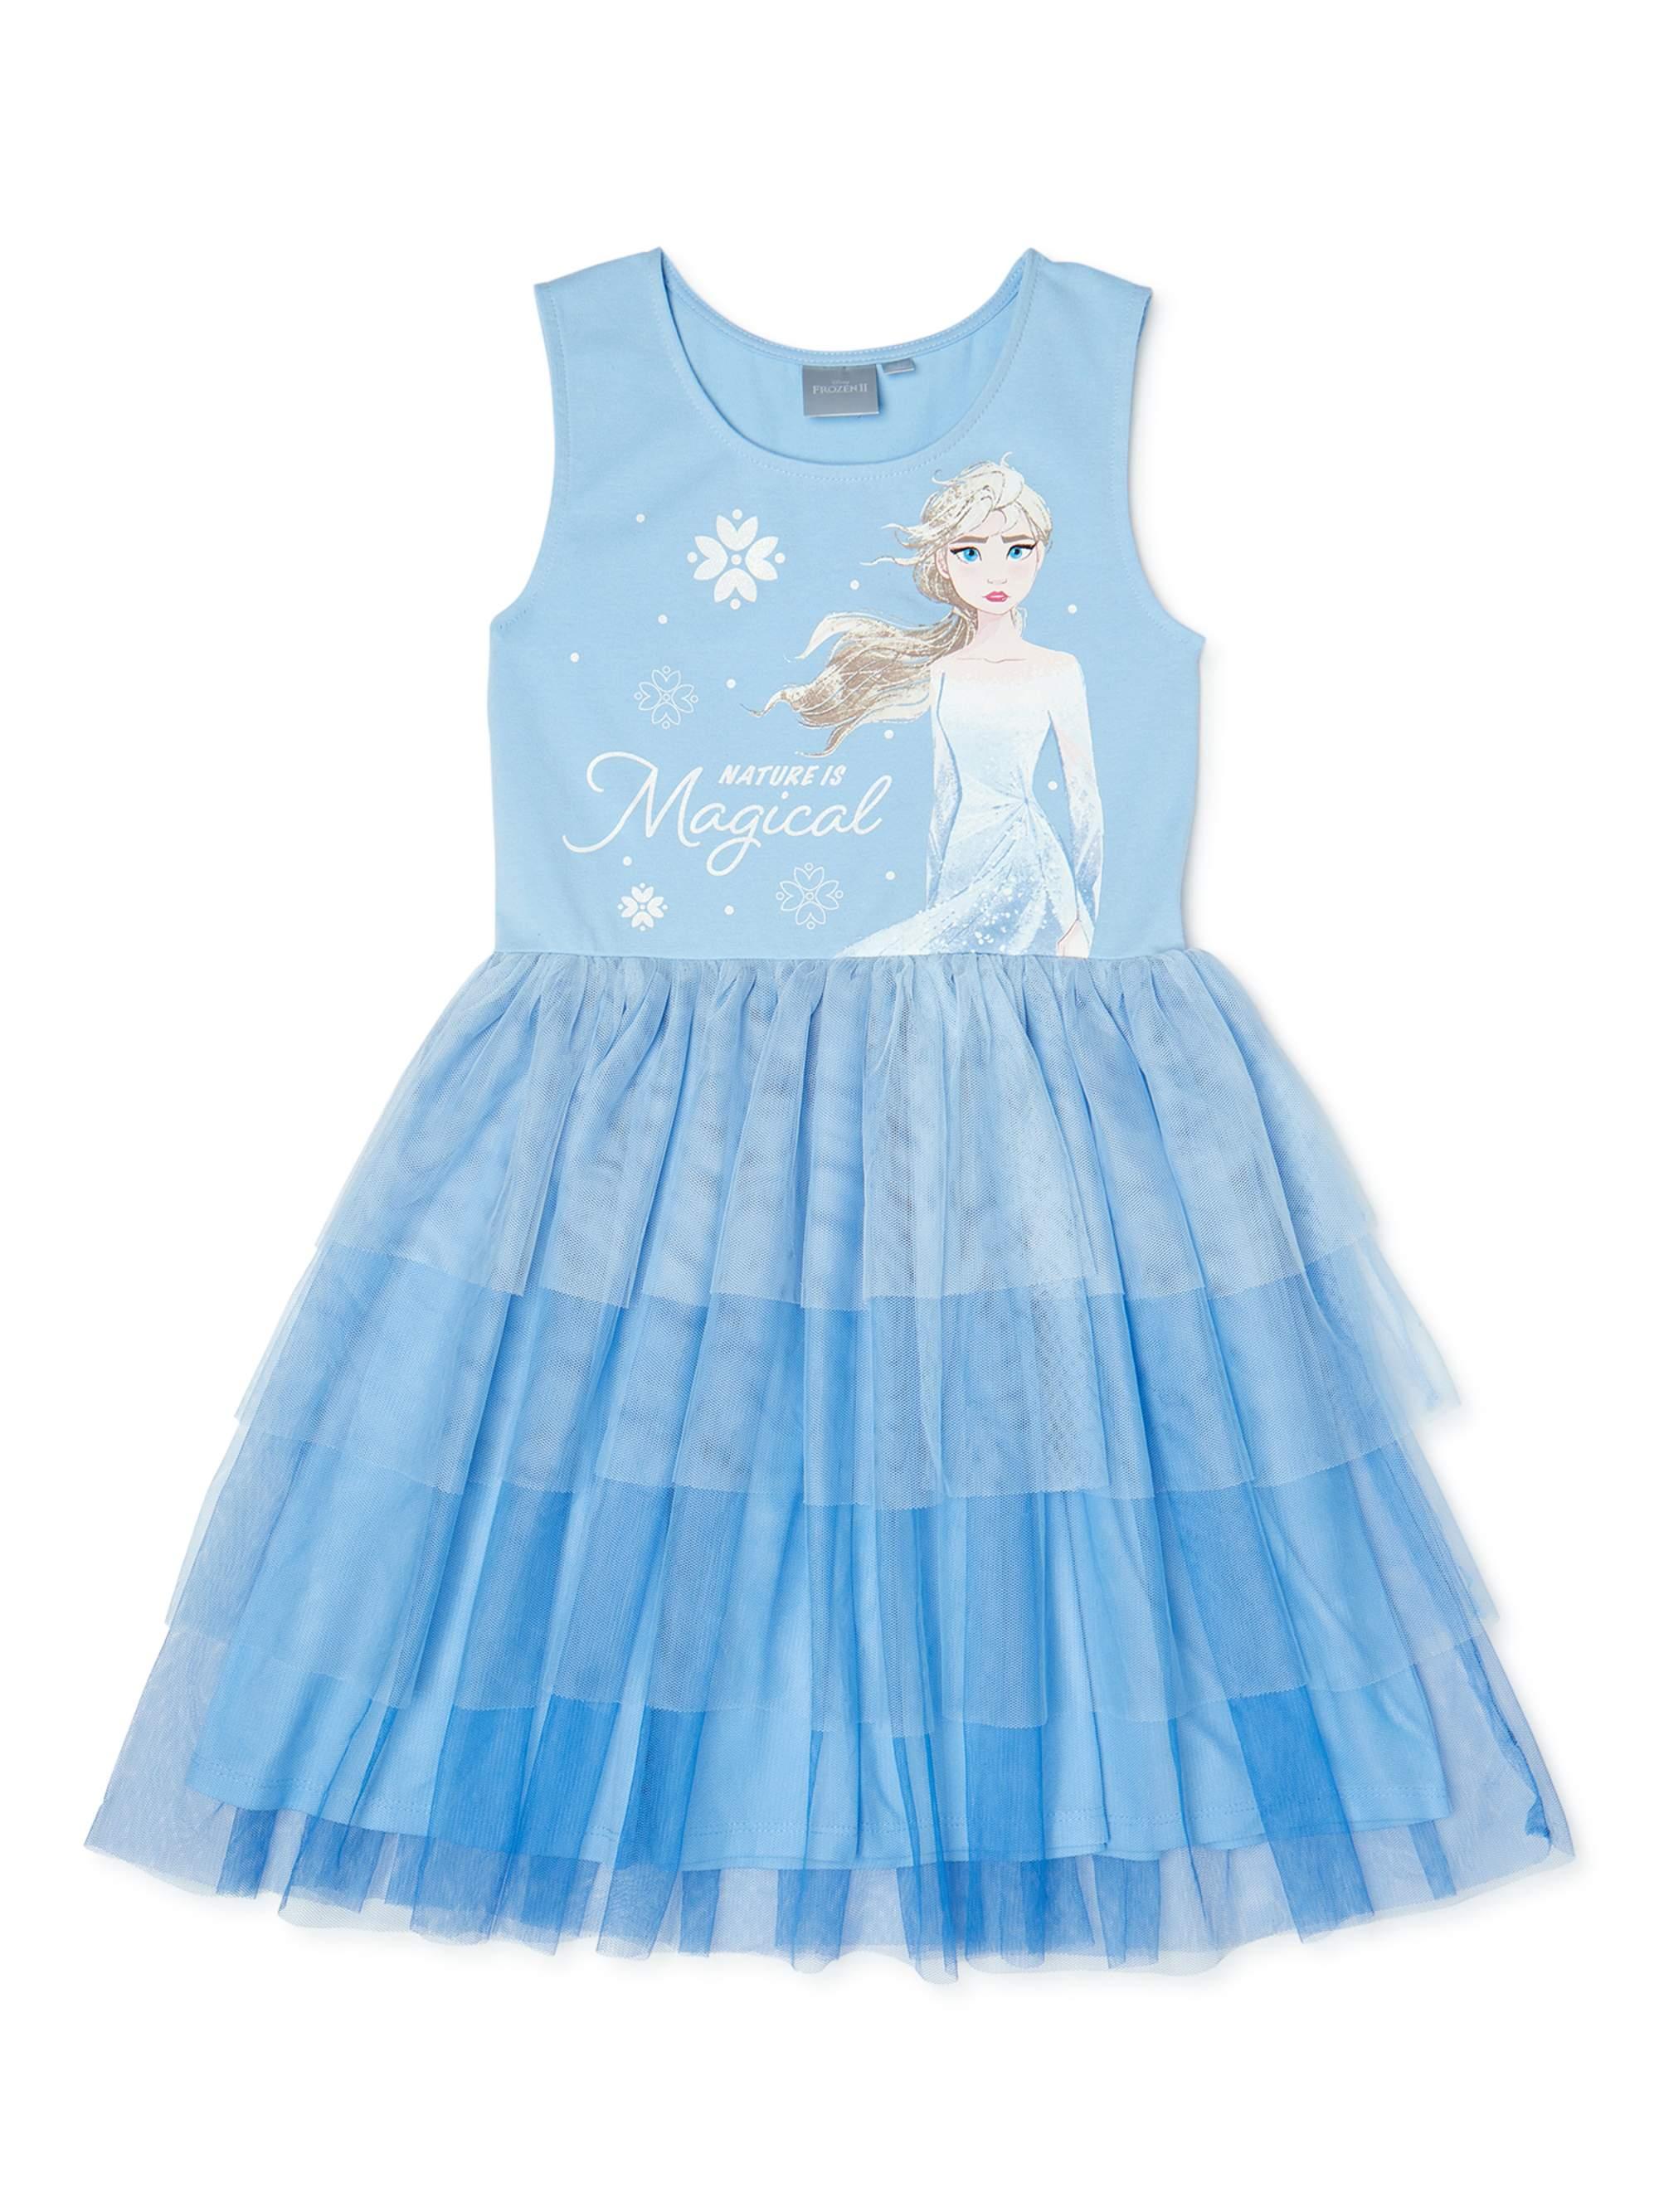 Frozen 2  Disney Frozen 2 Girls Exclusive Princess Tutu Dress, Sizes 4-16